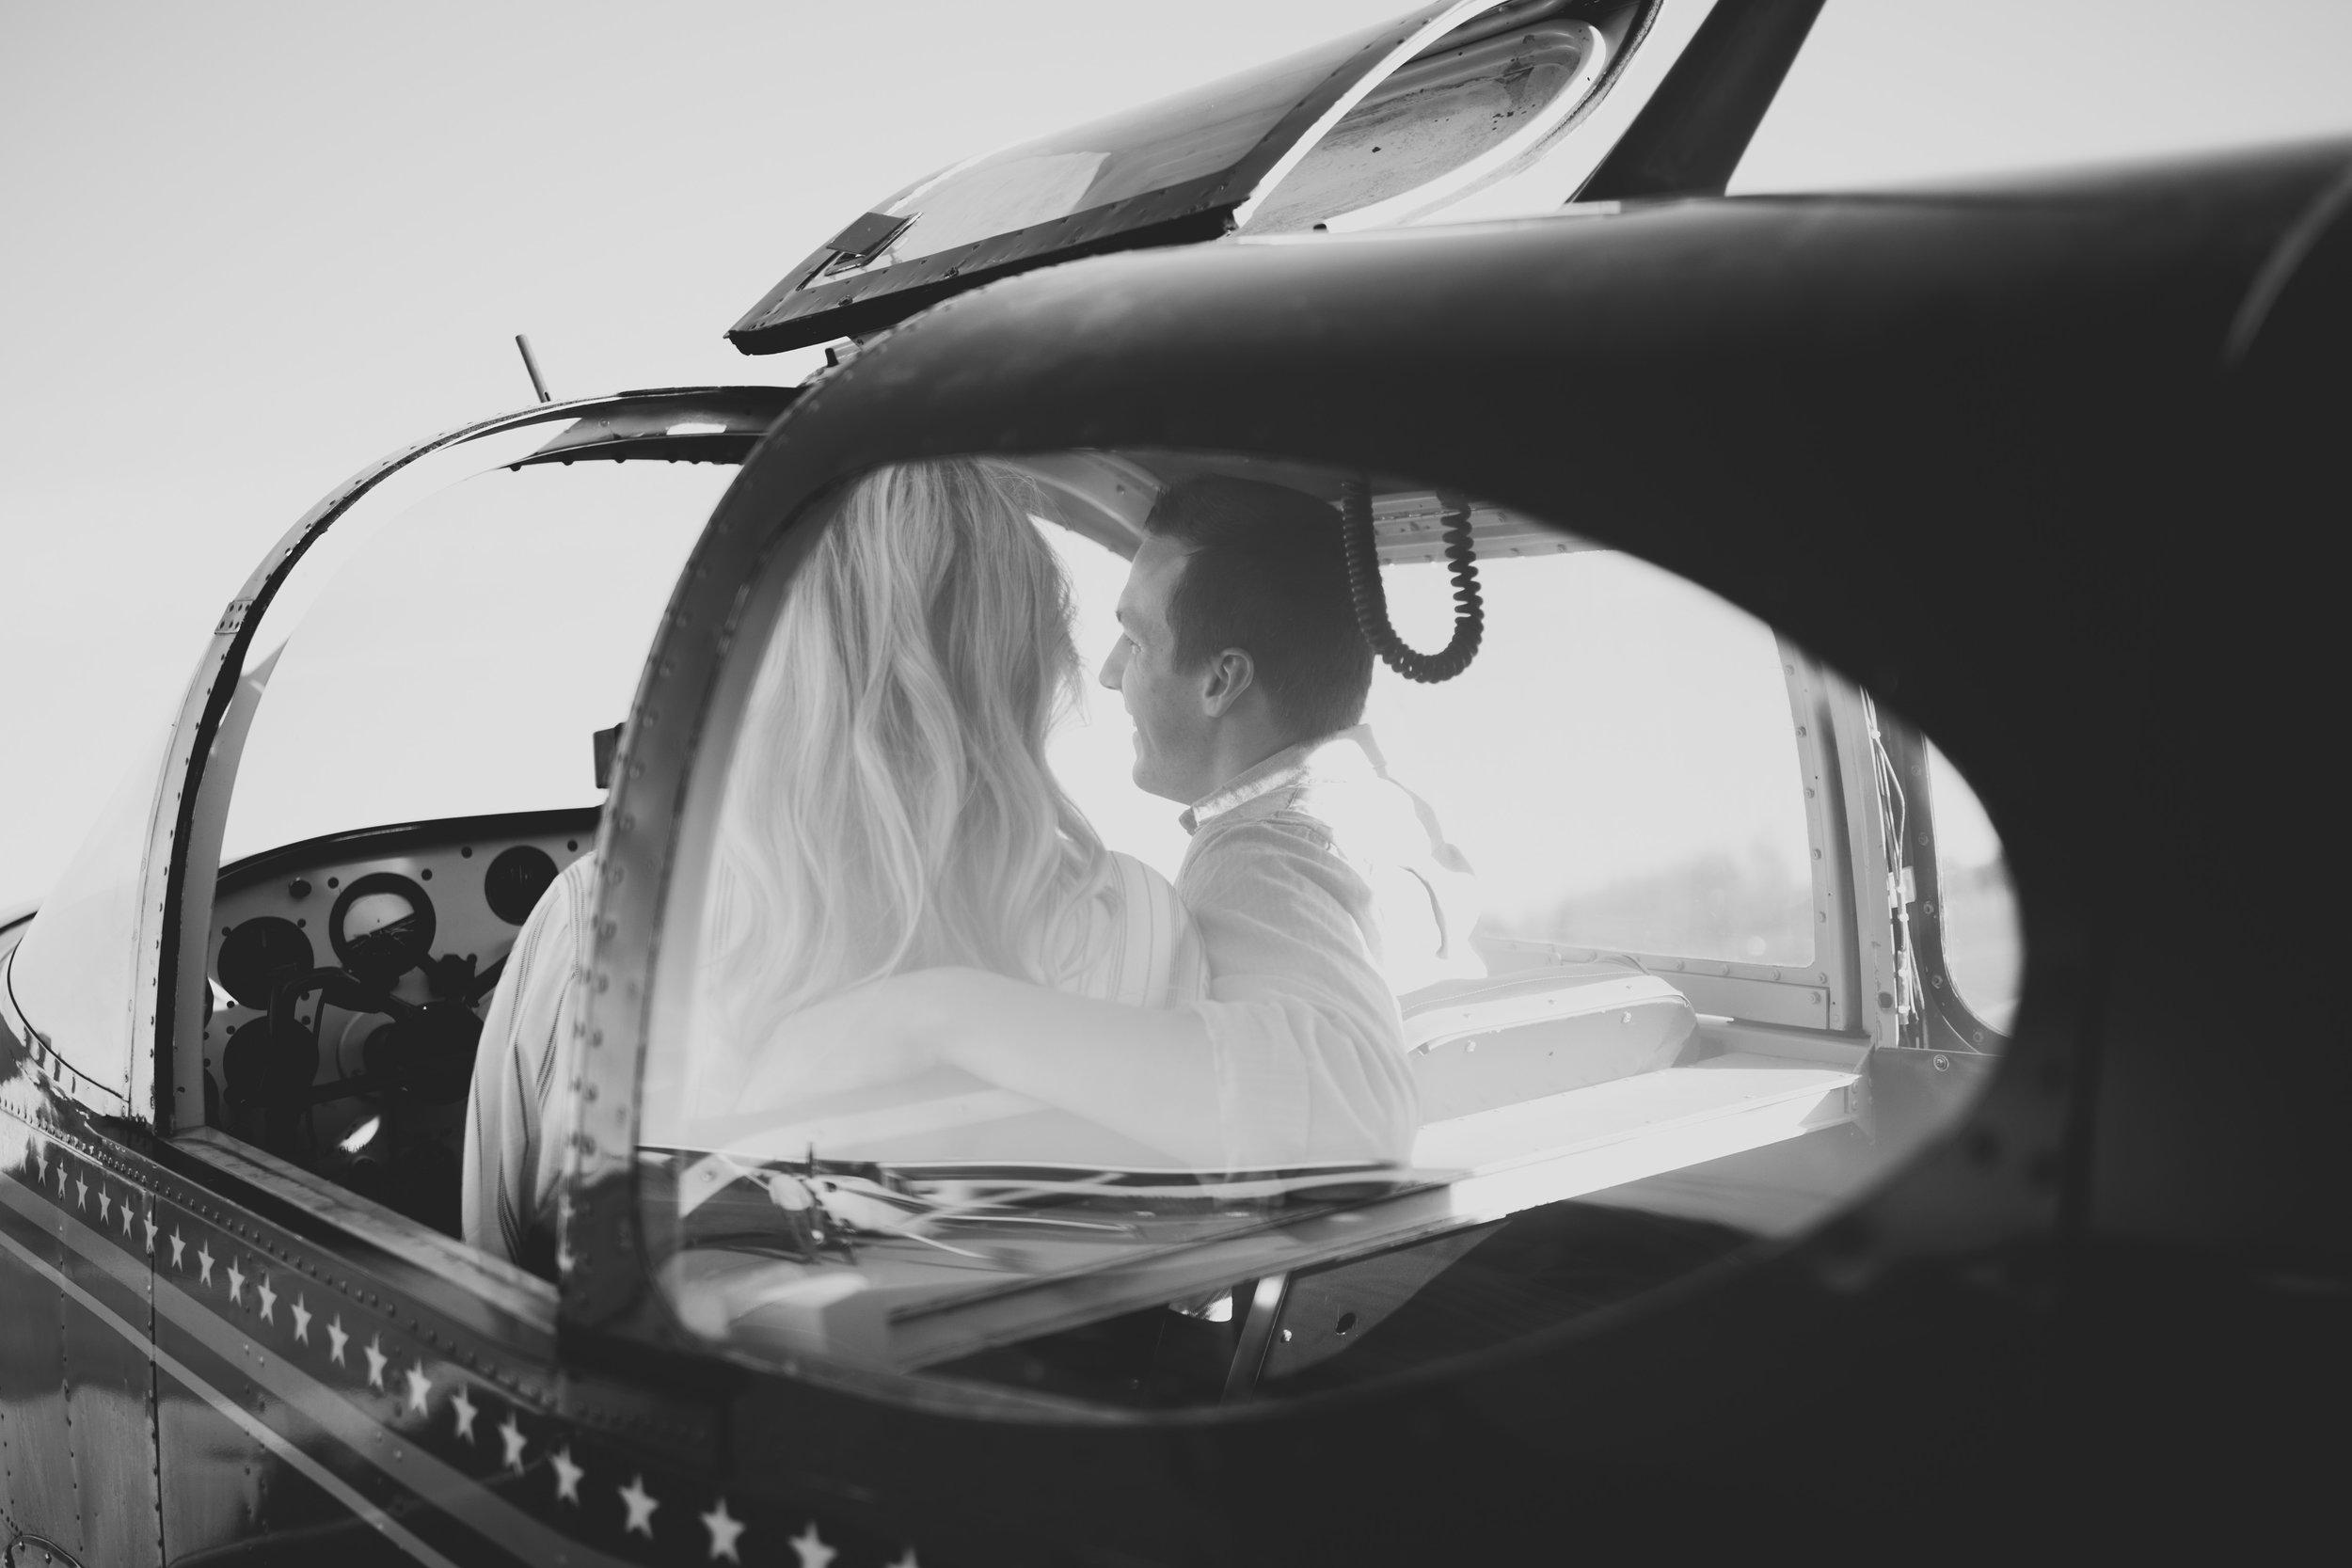 Grand Rapids Photographer - J Darling Photo - jessica darling - grand rapids wedding photographer - sparta airport - sparta michigan - jasmine and jeff engaged 036.jpg